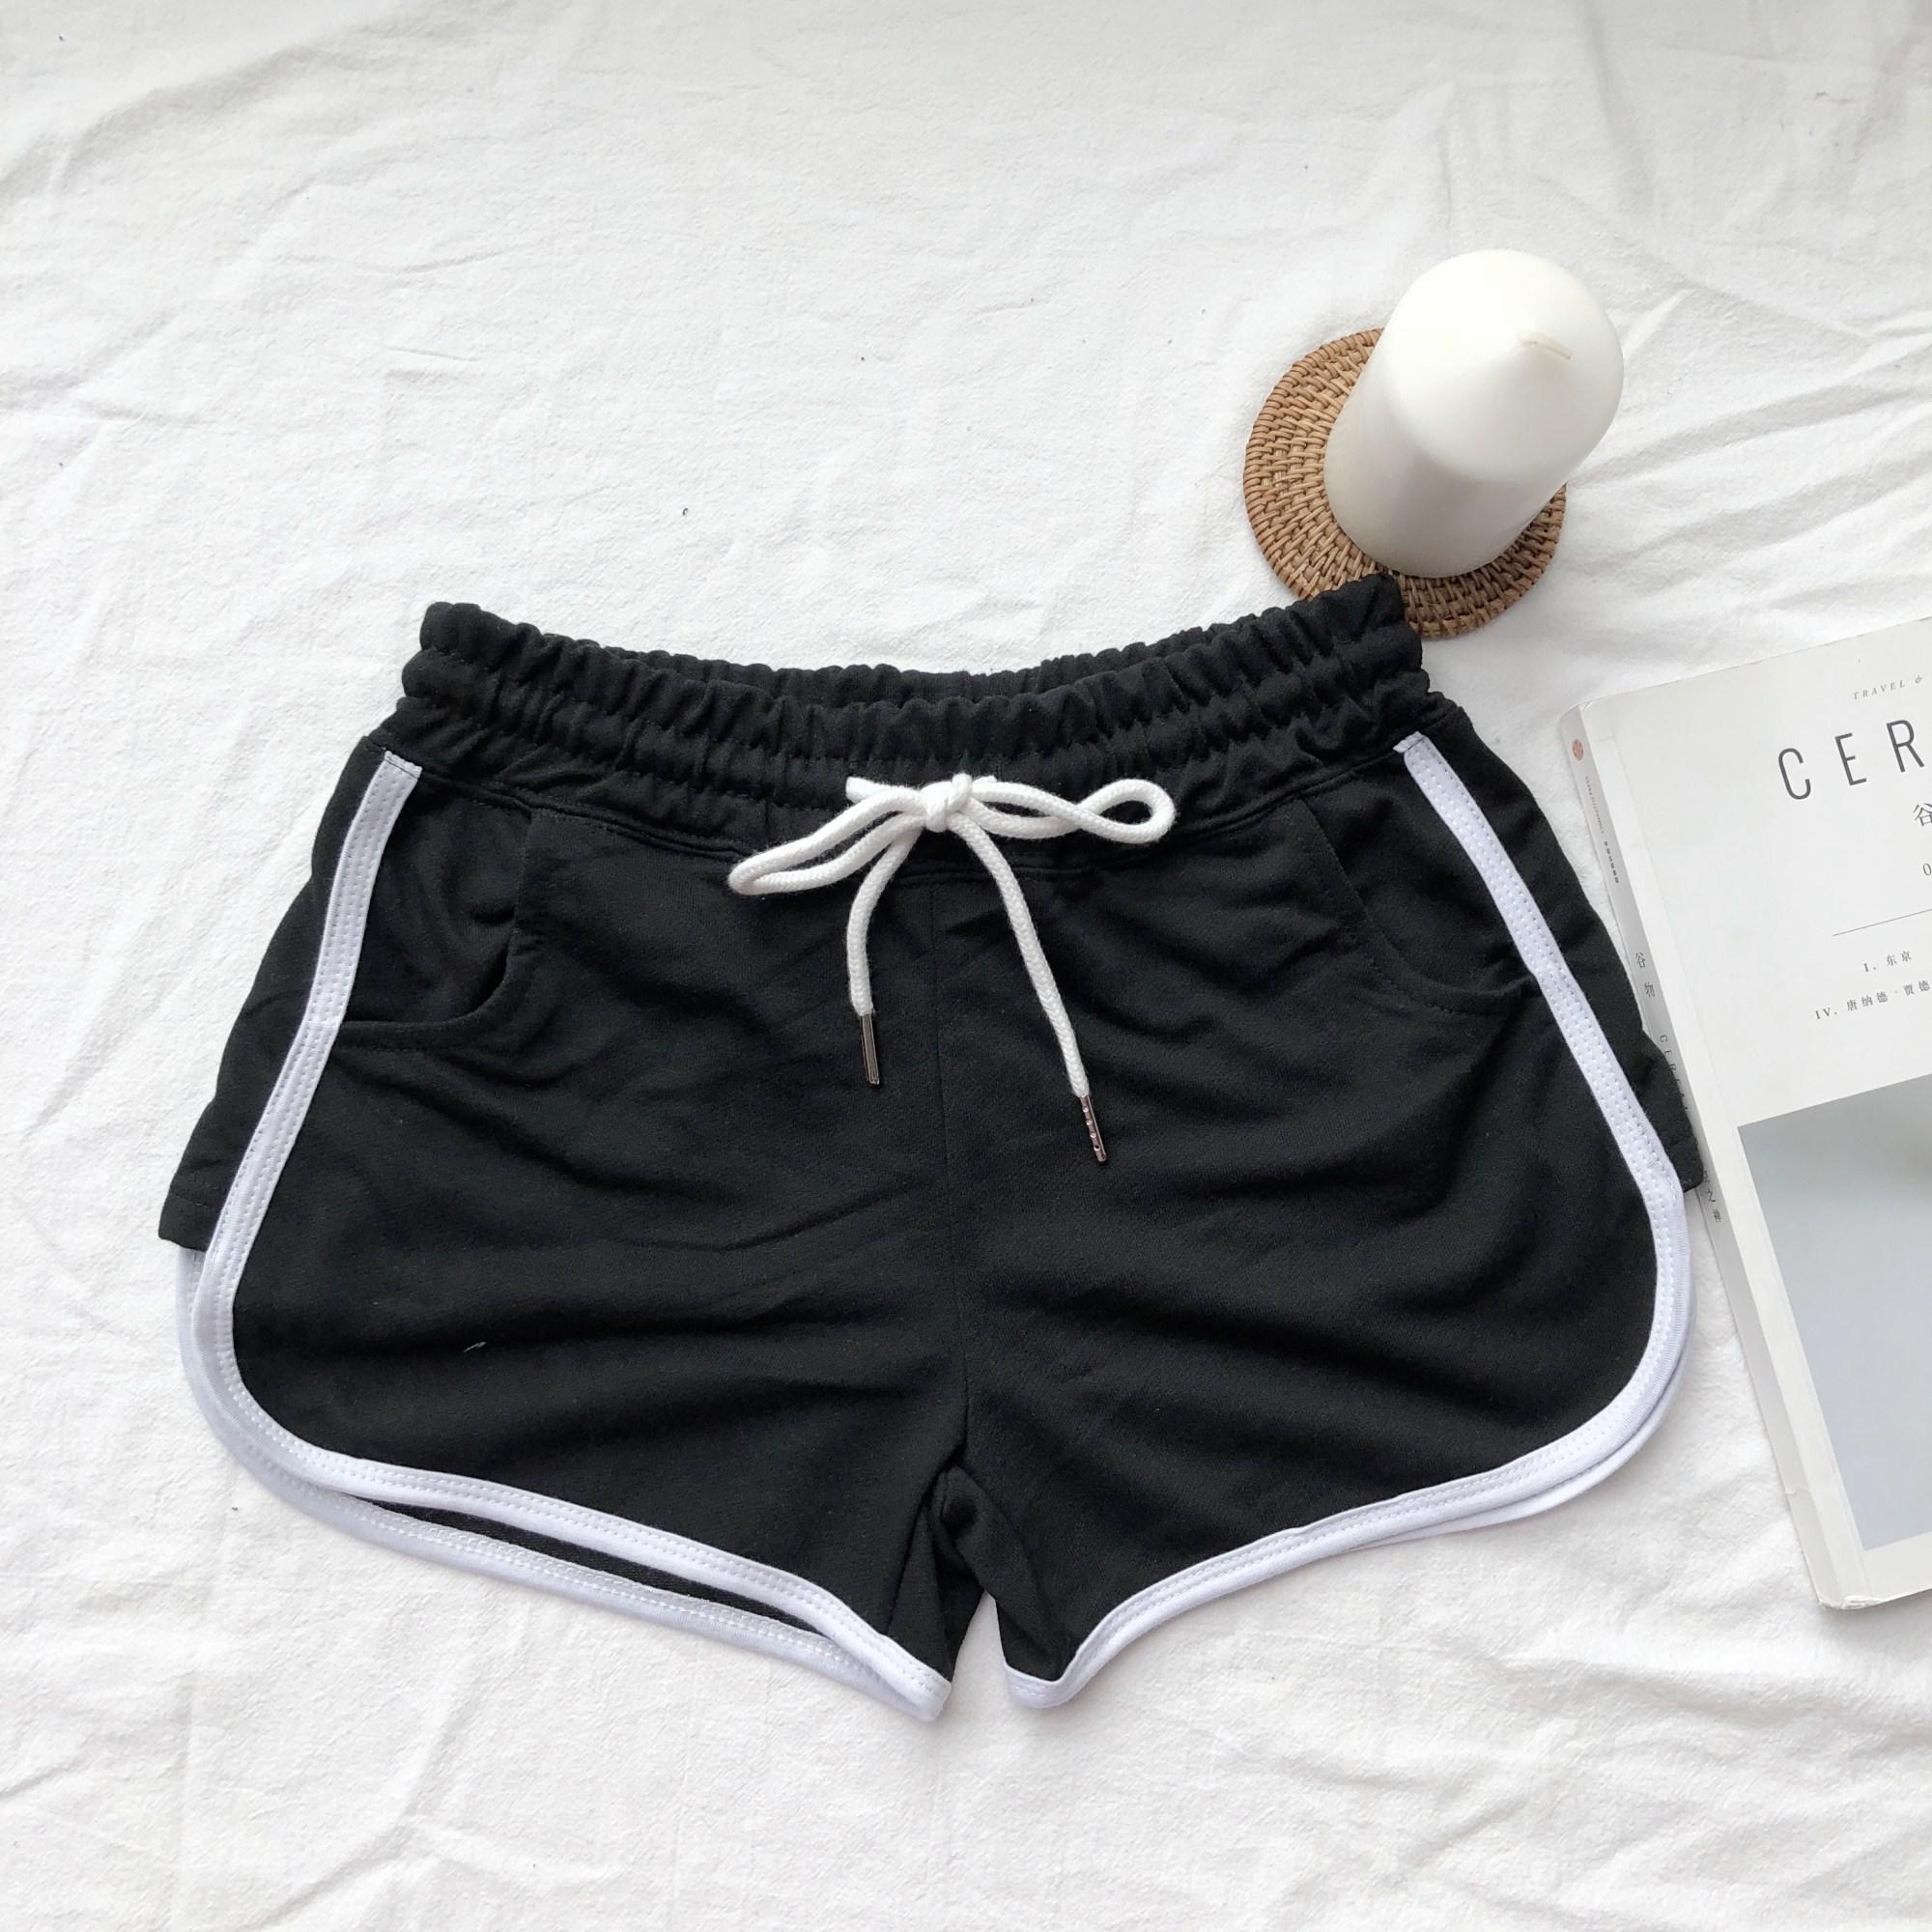 Ulzzang Celana Cargo Baru Celana Pendek Korea Fashion Style Siswa Longgar